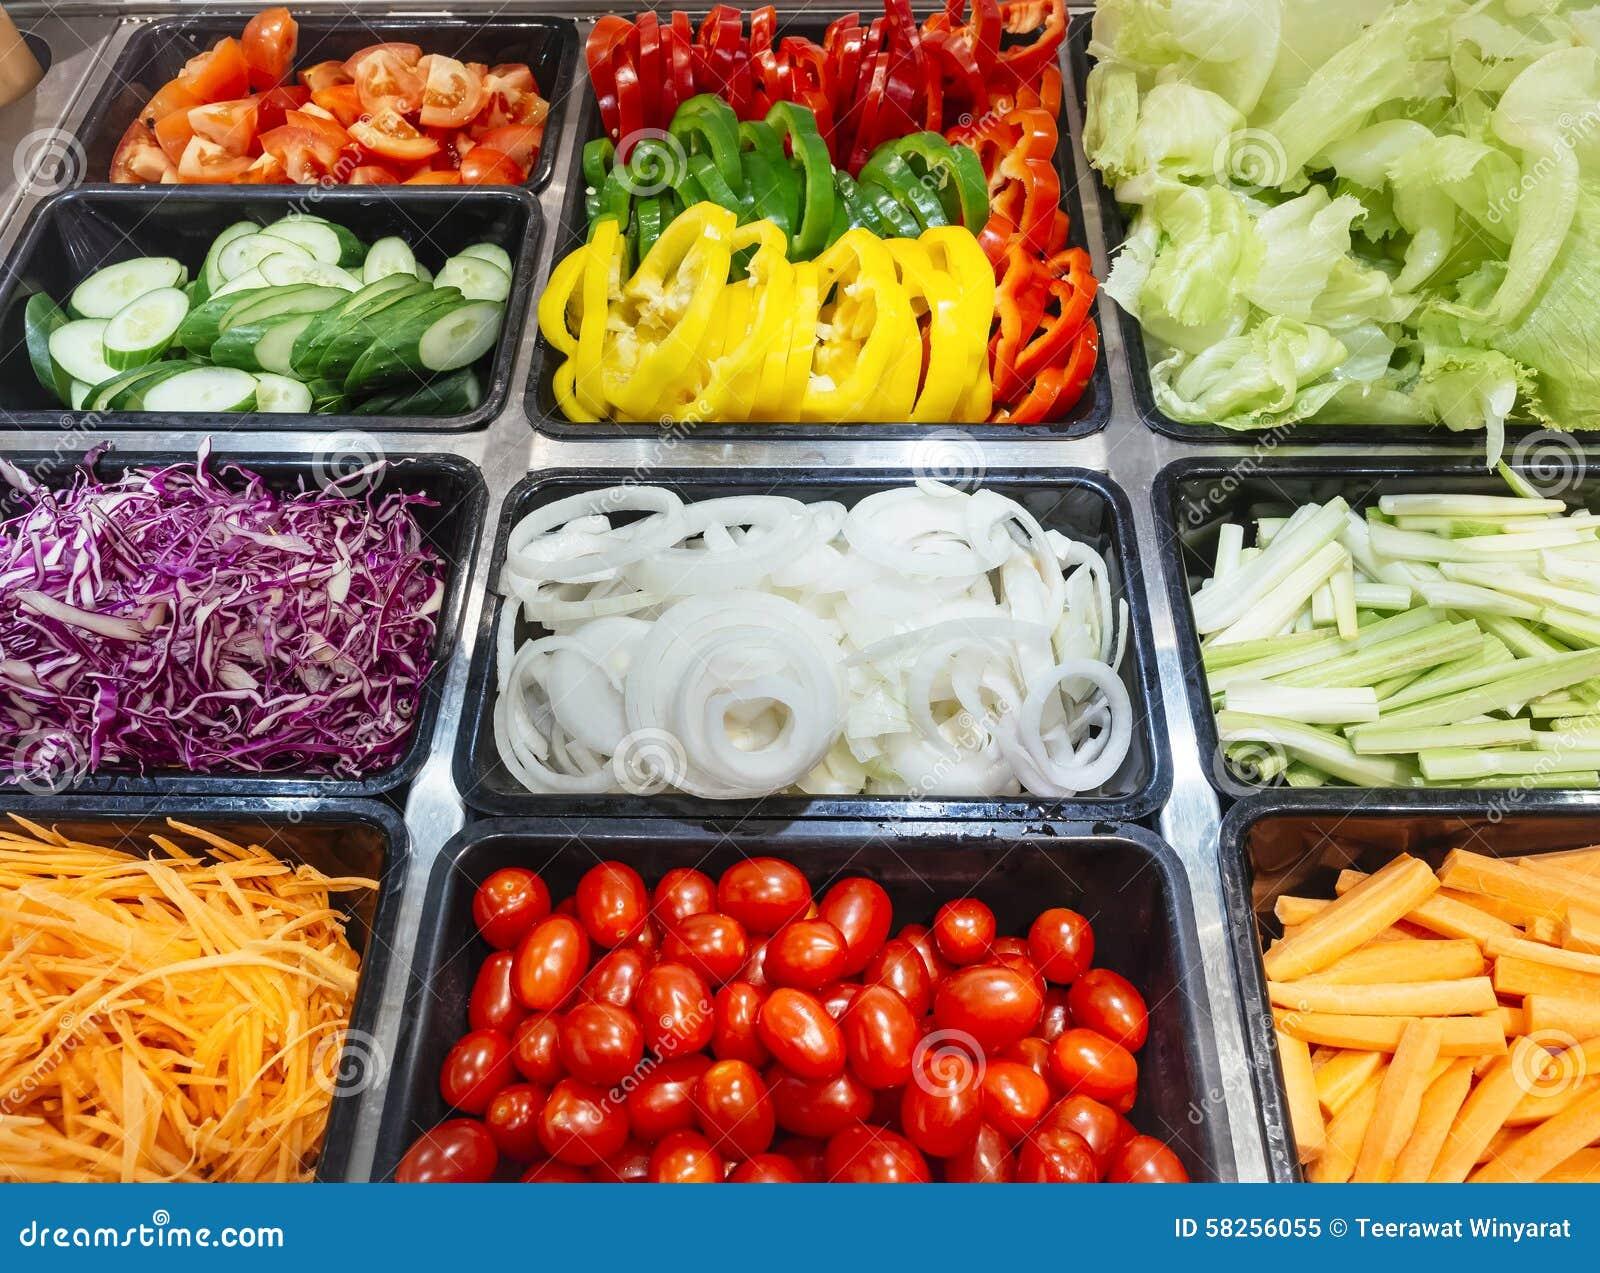 Salad bar fresh vegetables healthy food stock photo for Food bar health